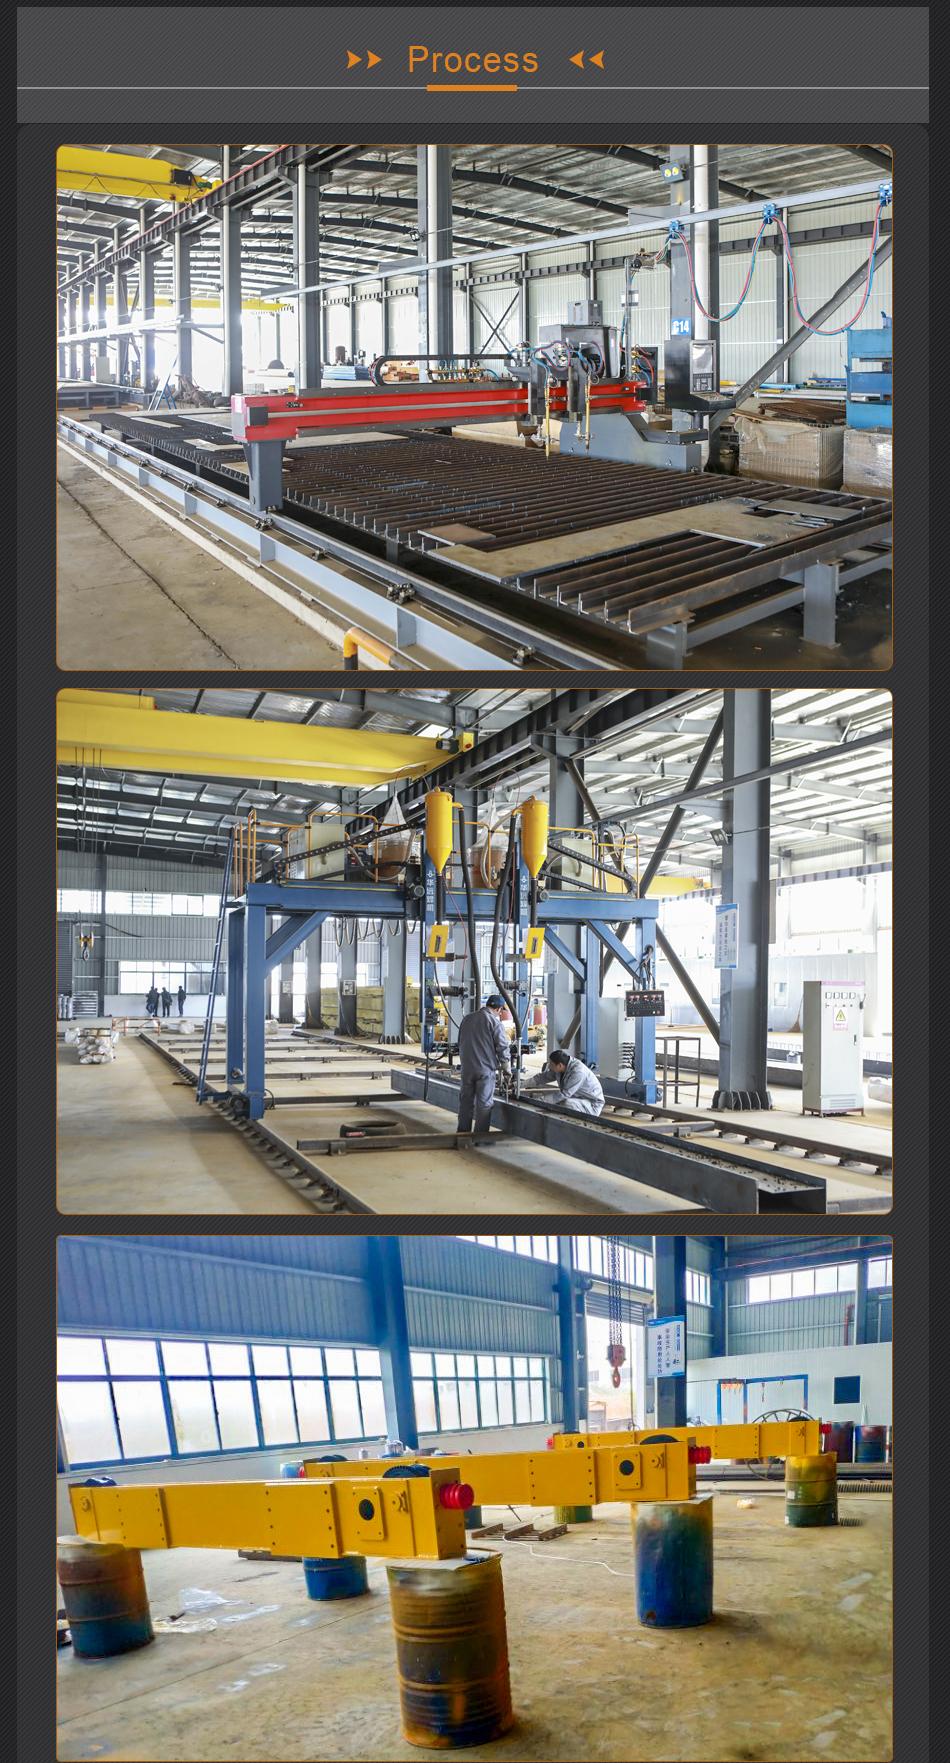 Txk Overhead Crane Price 5 Ton With Electrical Wiring Diagram